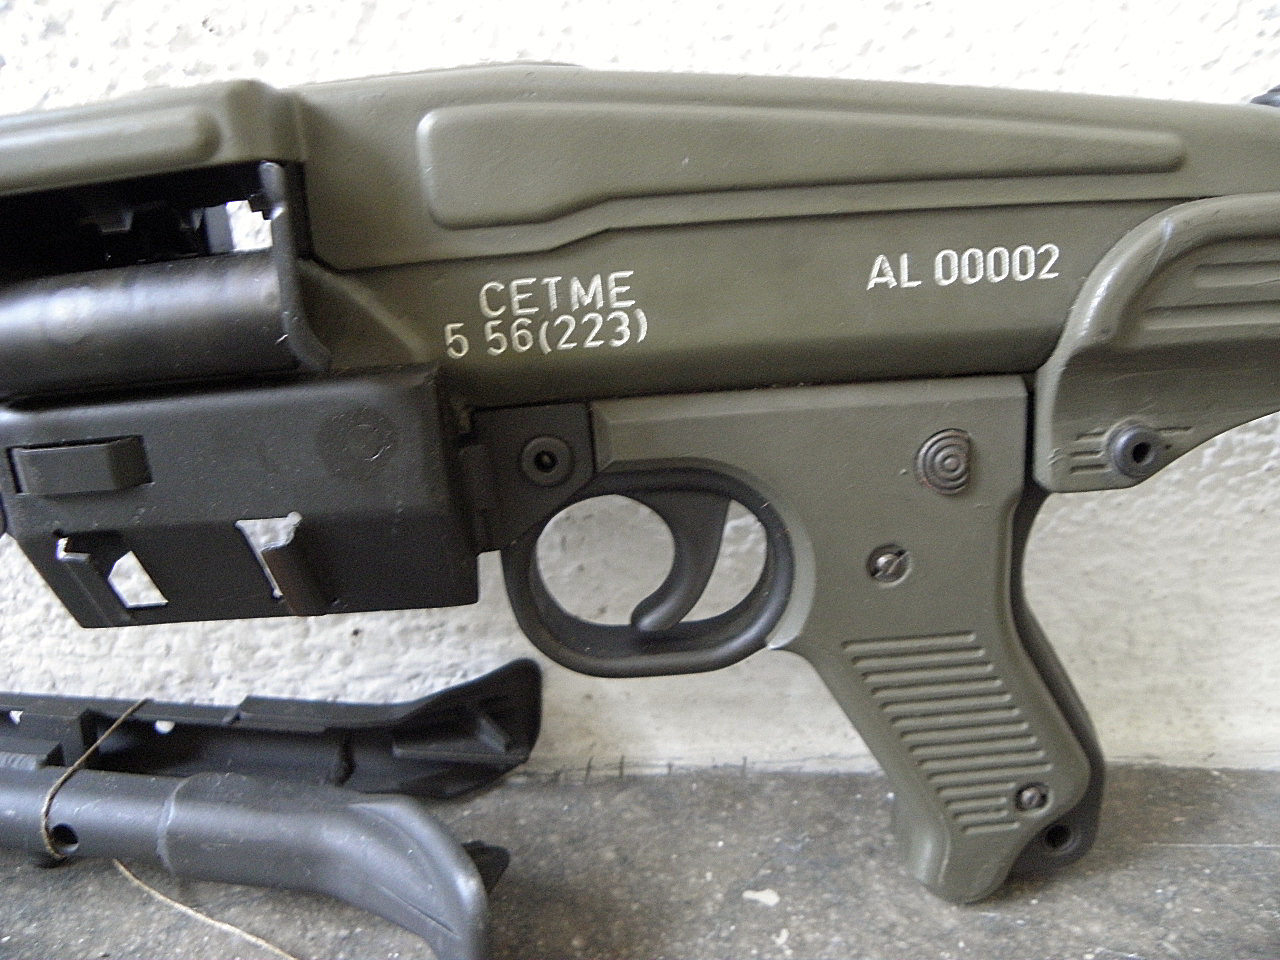 Ameli Primer Modelo - AL 00002 Eg91s1